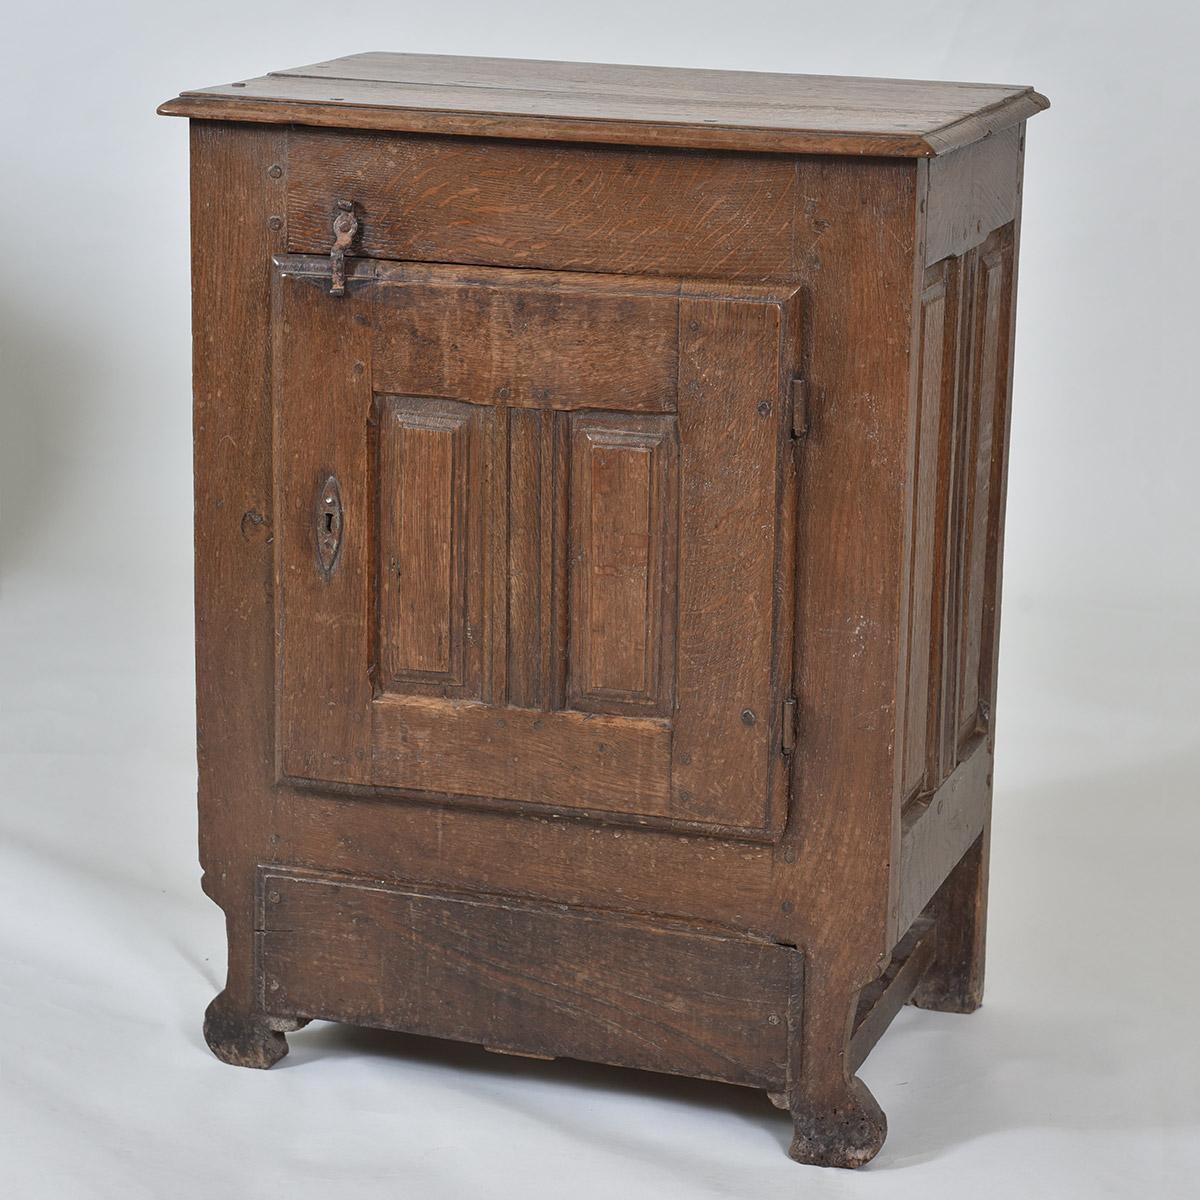 AF20-5498 - Small Antique Cupboard Elaine Phillips Antiques